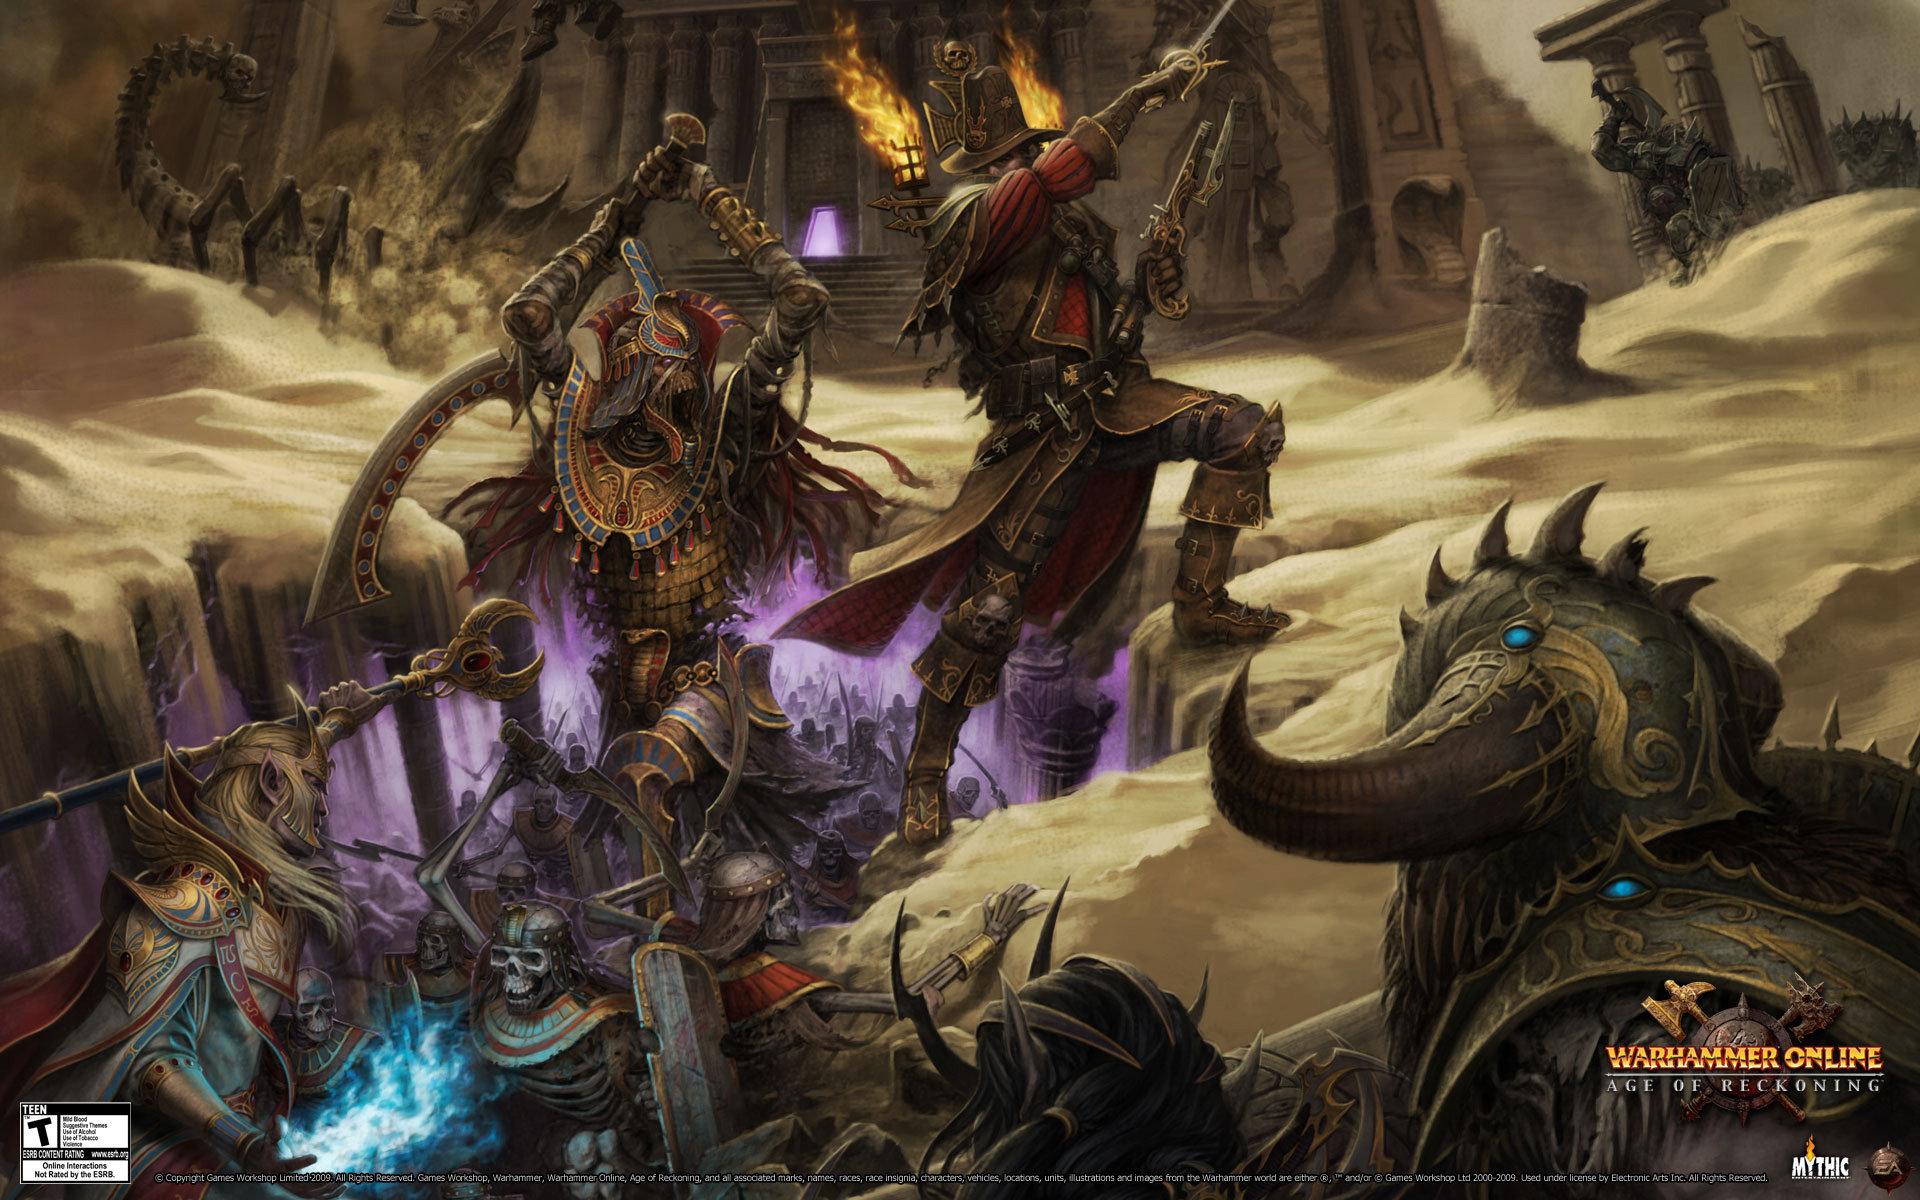 Free Download Warhammer Online Age Of Reckoning Wallpaper Id253709